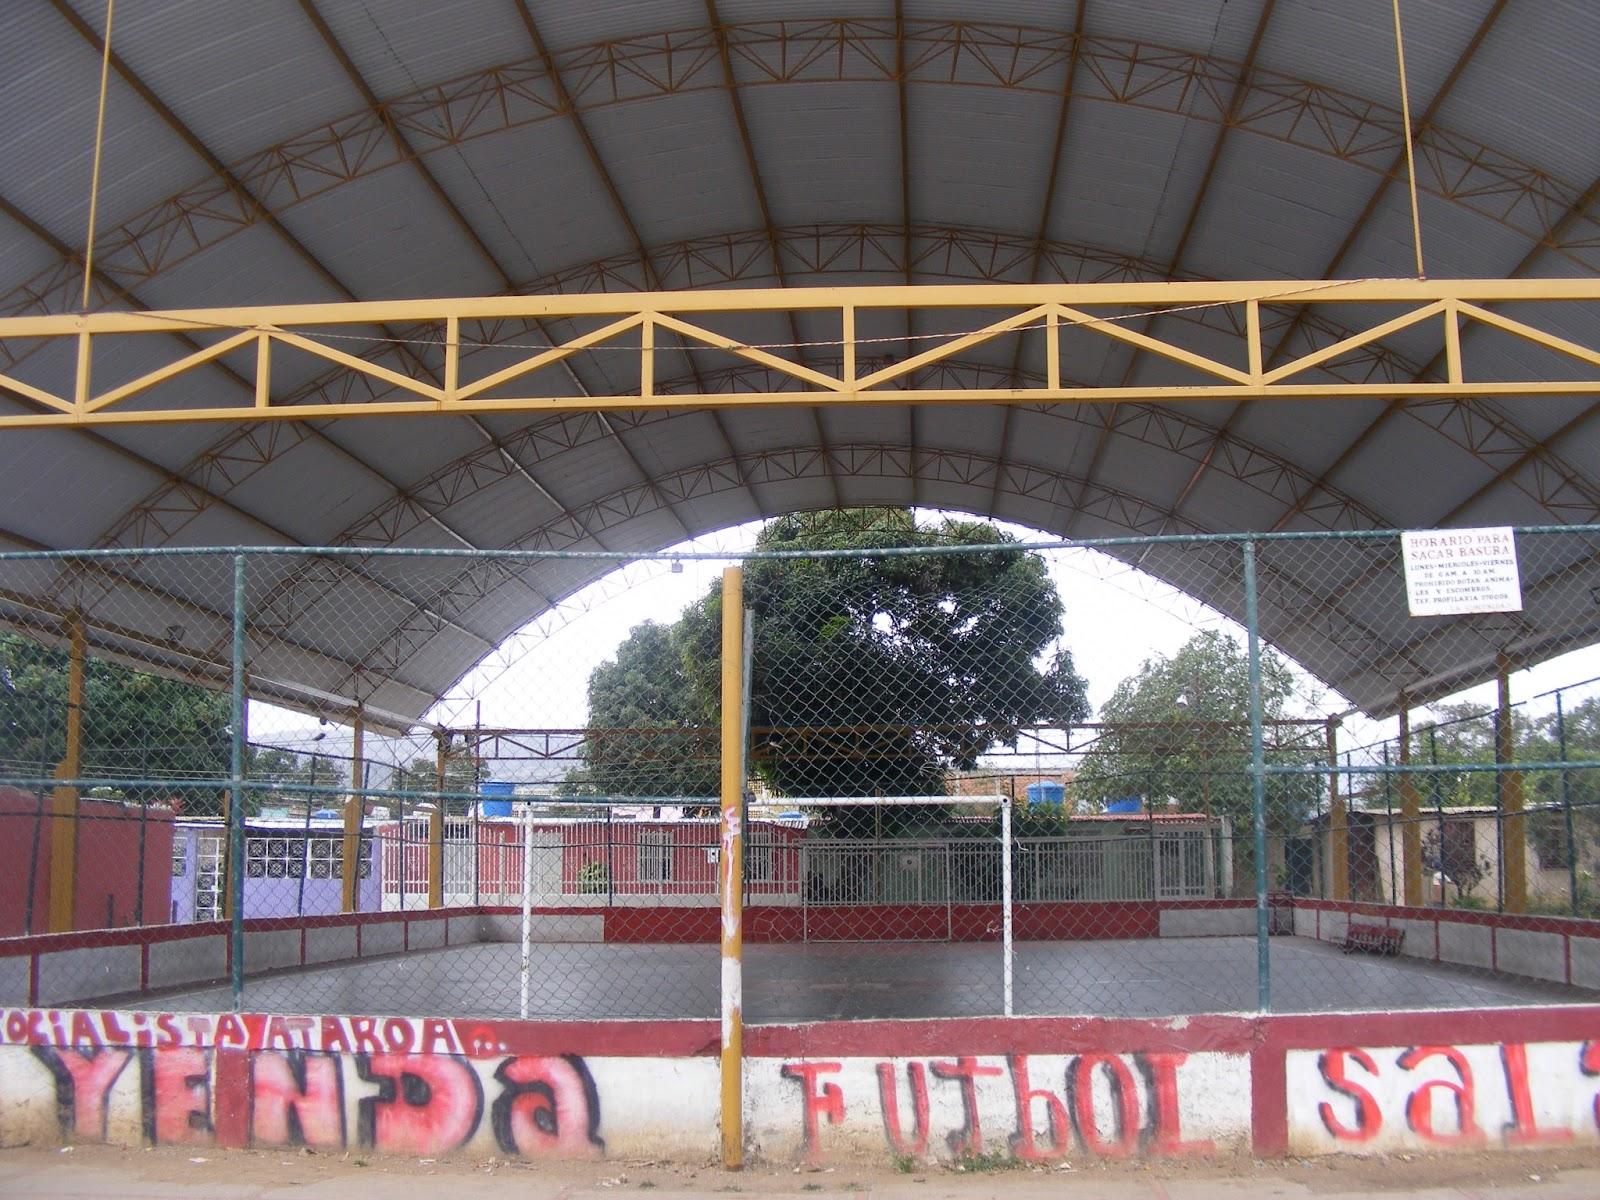 Imagenes De La Cancha De Futbol Sala - Medidas De La Cancha Futbol Sala Gratis Ensayos